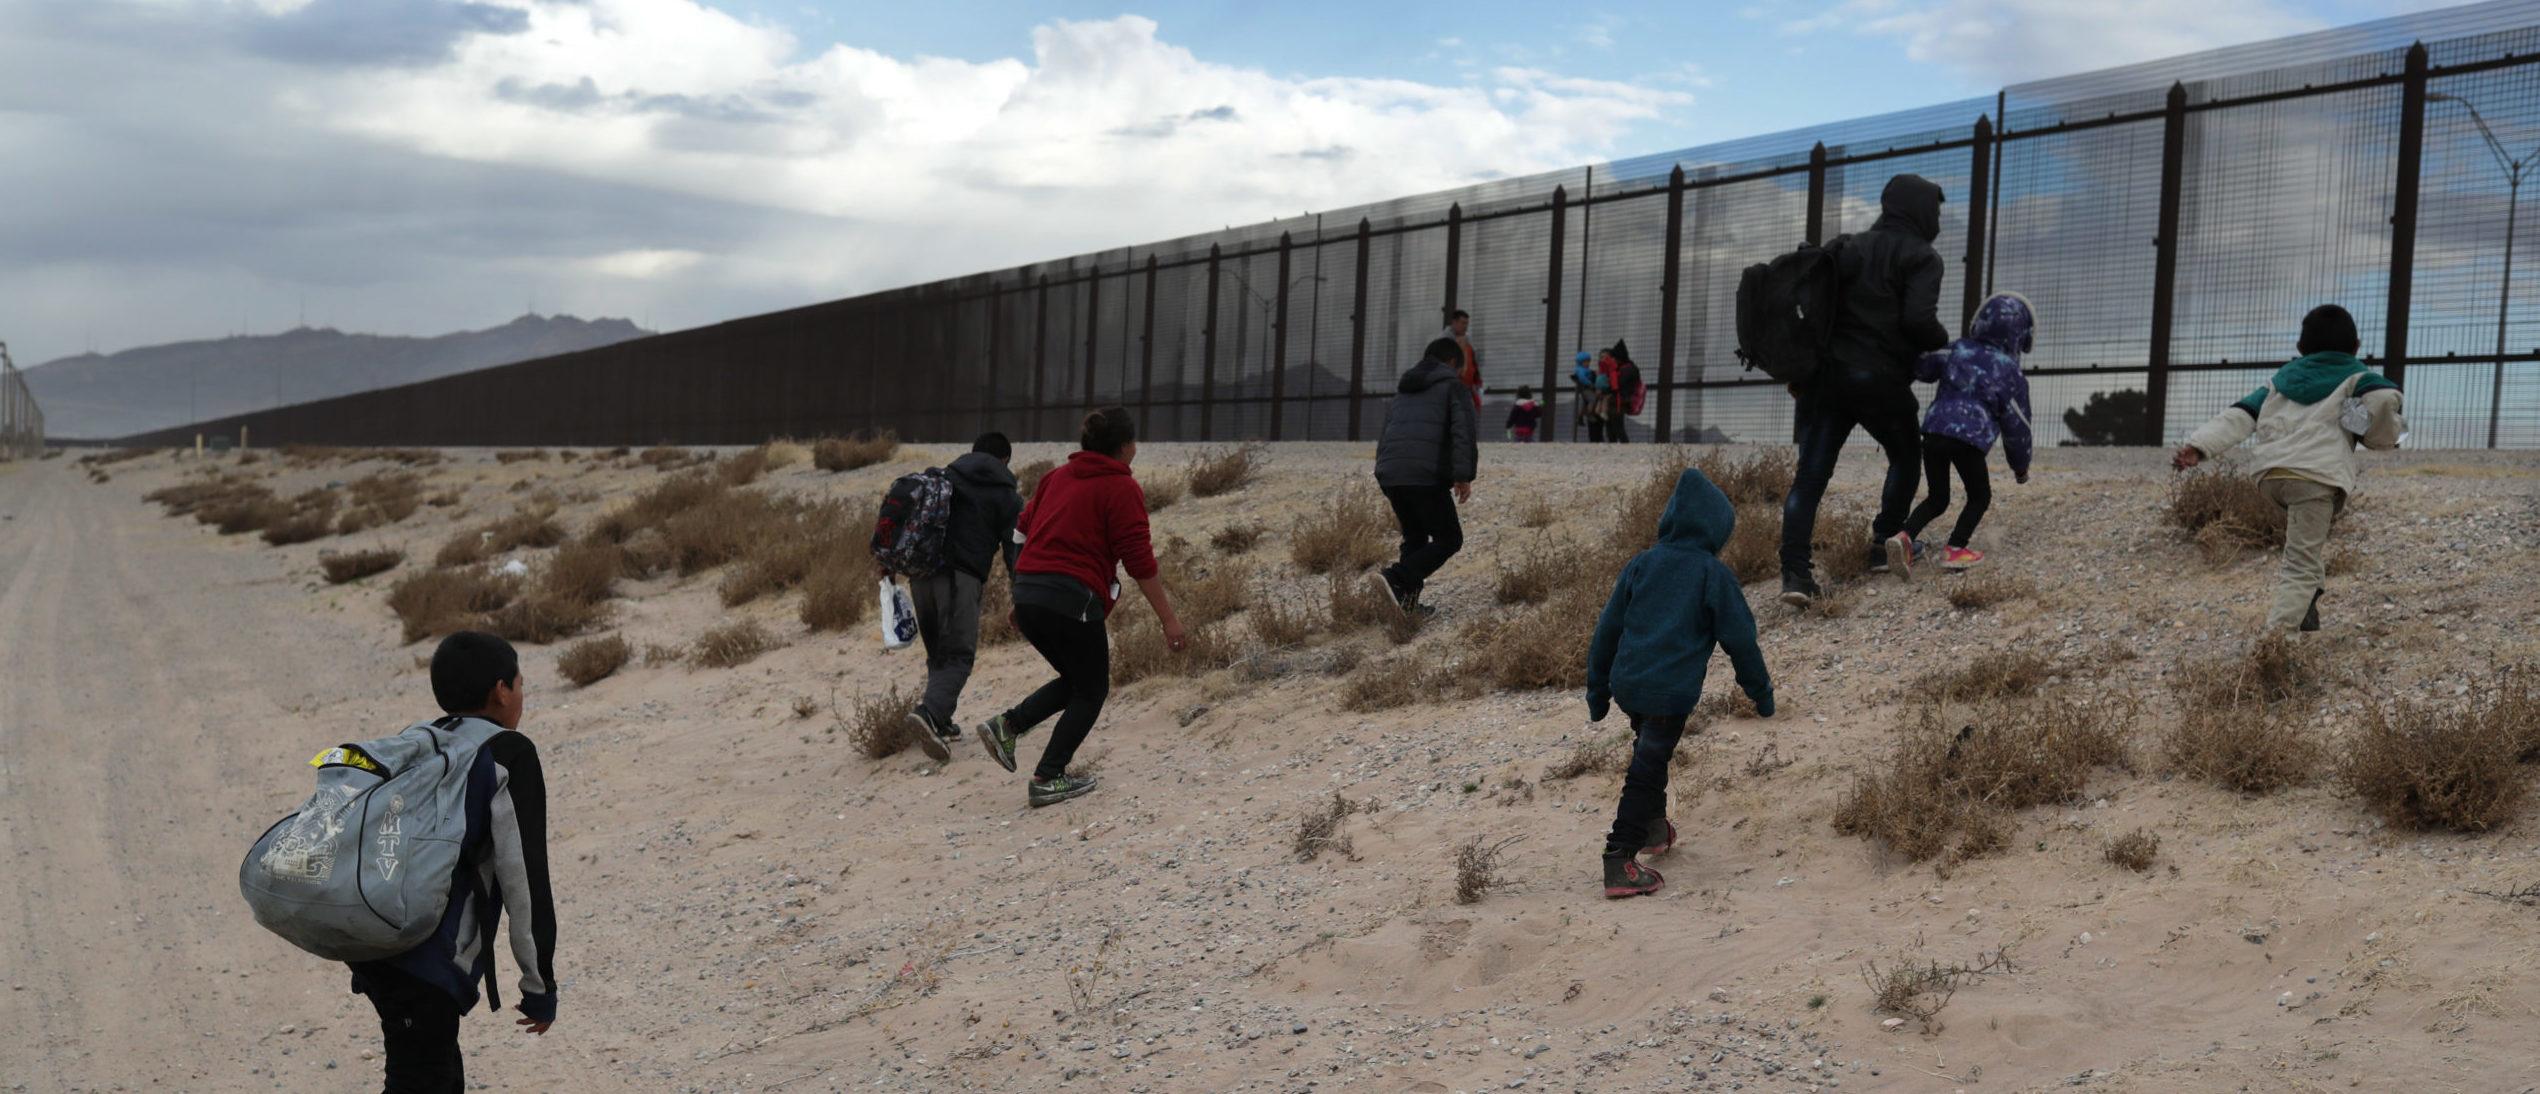 Missouri, Texas Sue Biden Administration Over Border Wall